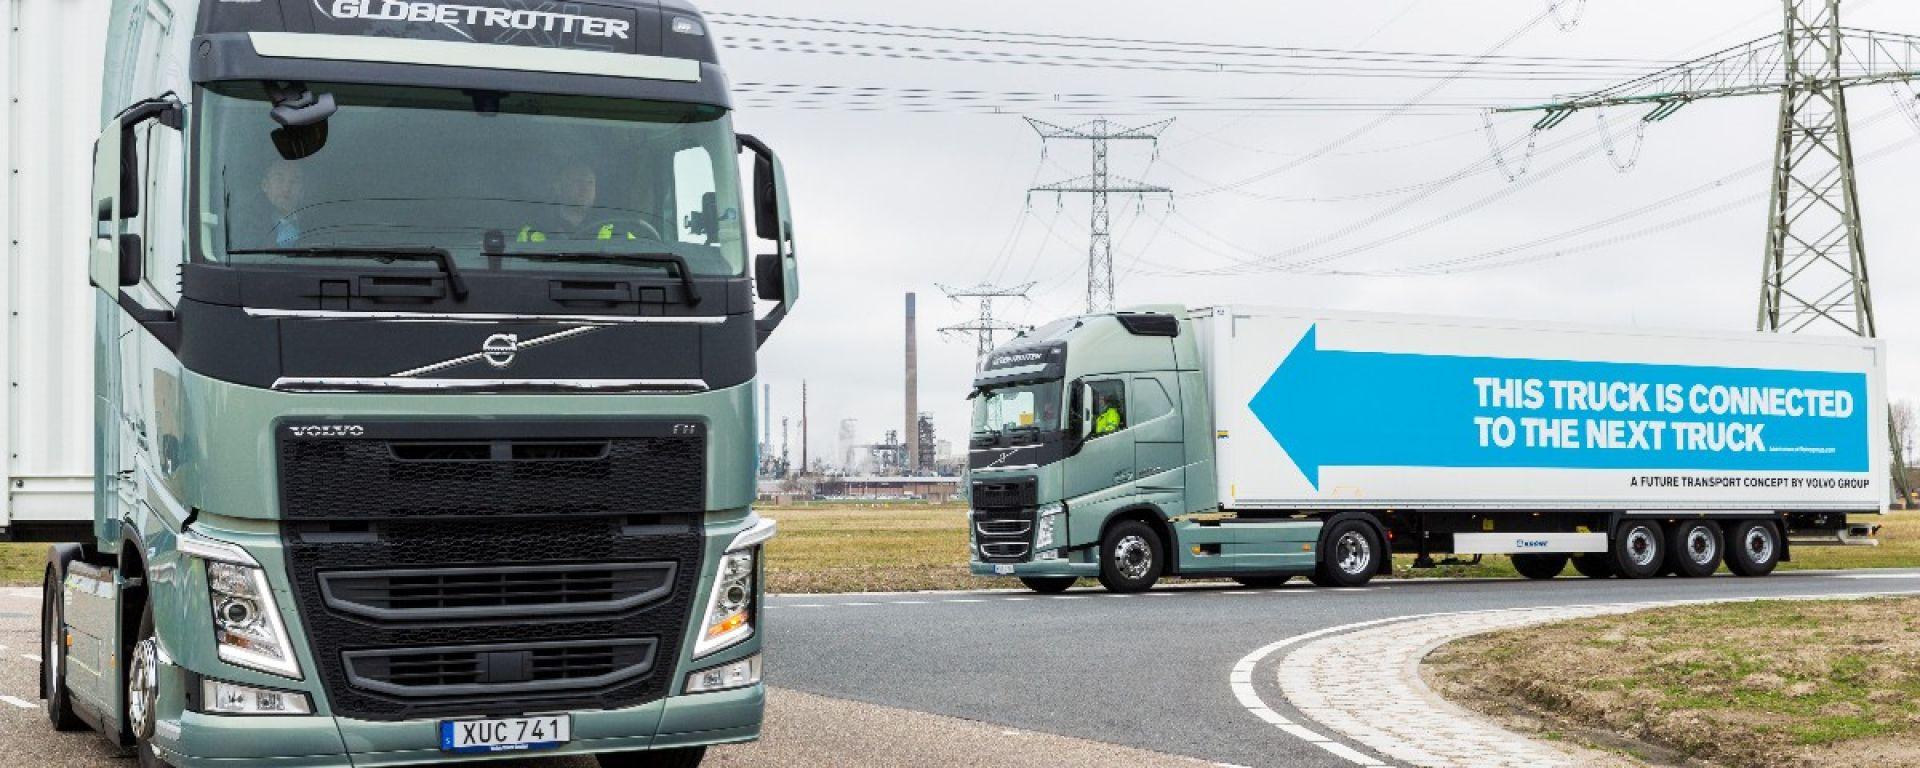 I camion robot di DAF, Daimler, Iveco, MAN, Scania e Volvo attraversano l'Europa